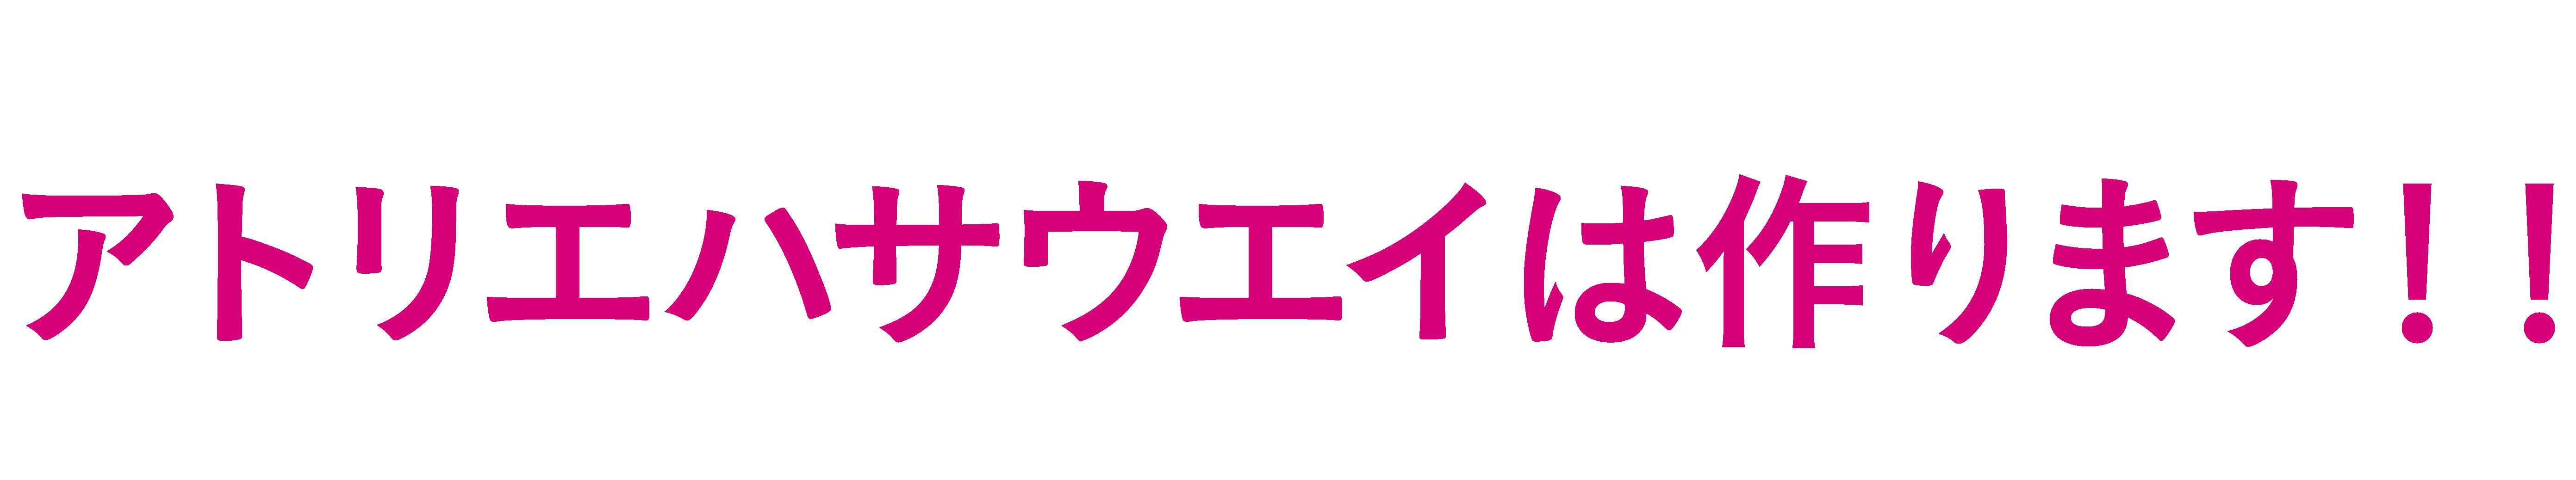 at-01